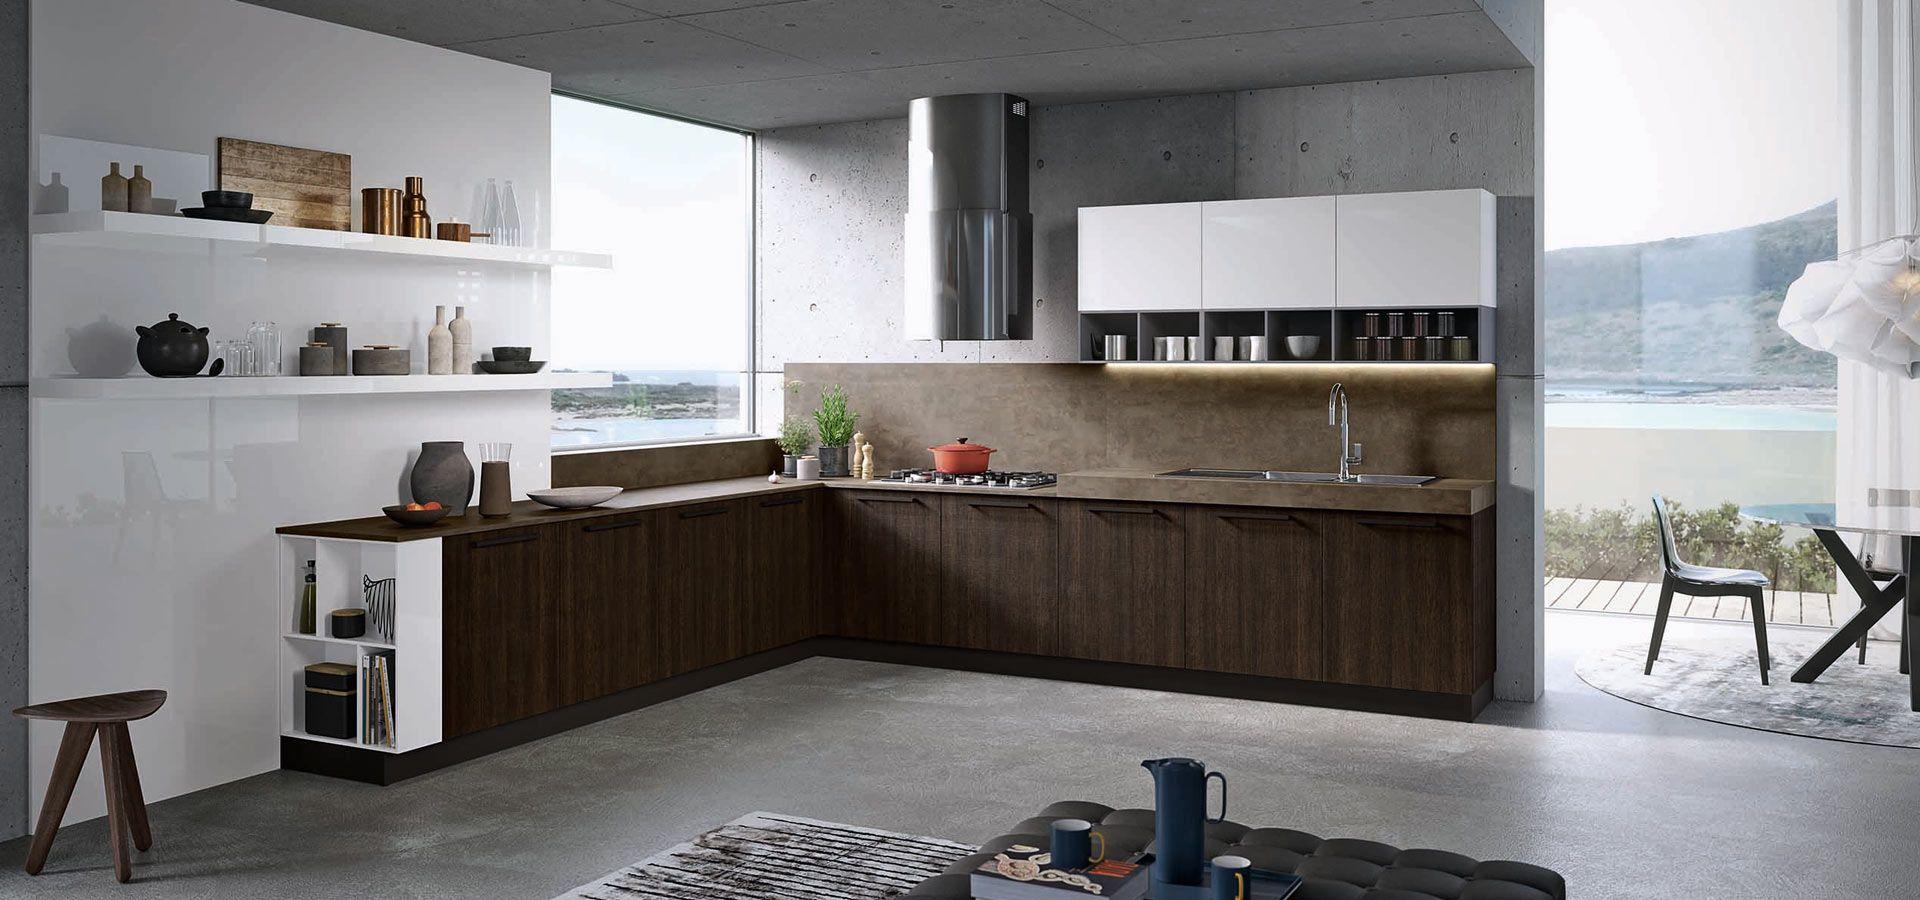 Cucina Moderna Lucida Grigia e Bianca con Rovere - Round - Arredo3 ...